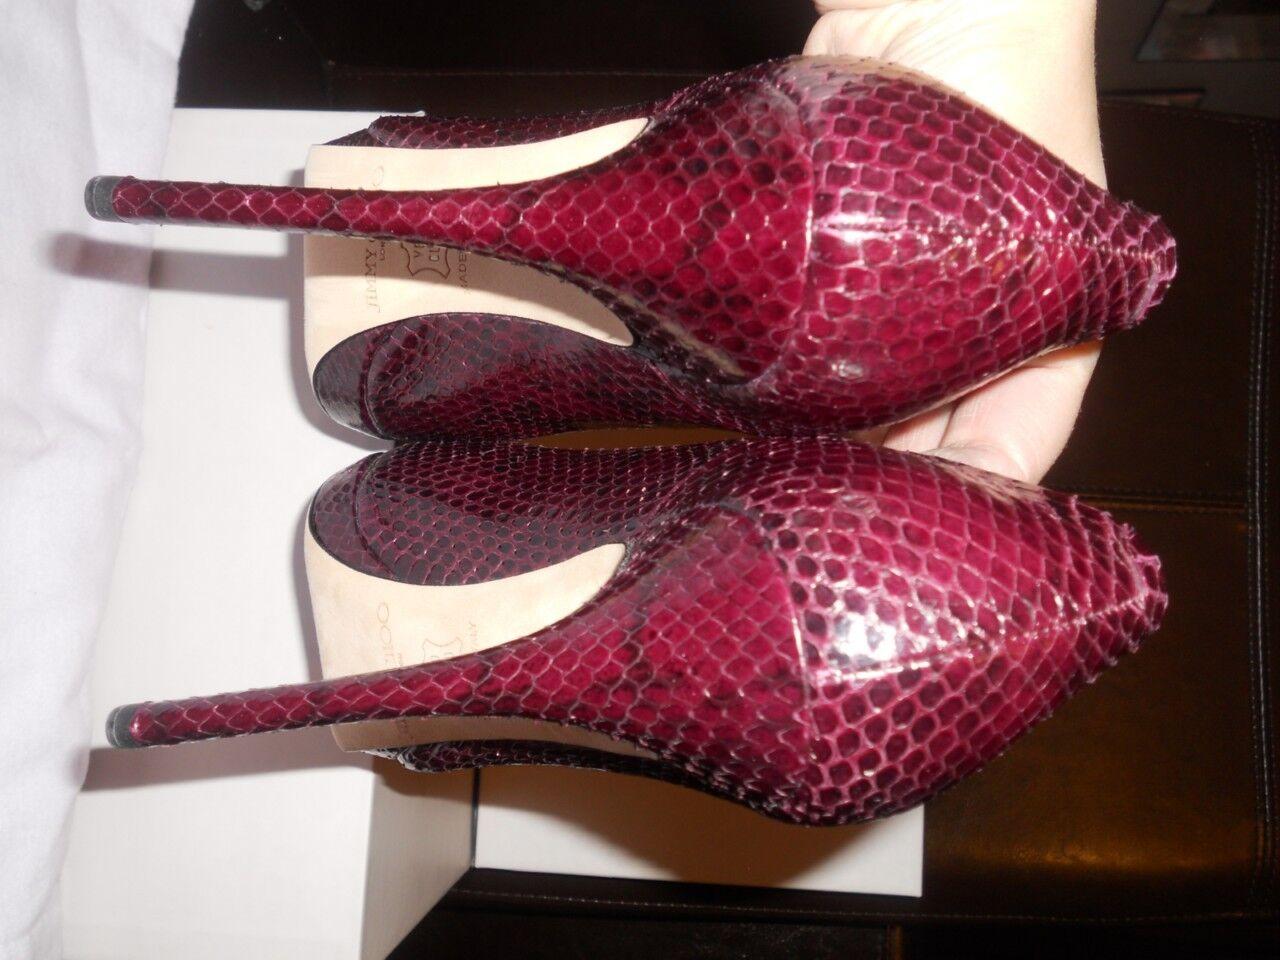 Jimmy Choo EMBER Snakeskin Platform Pumps Pumps Pumps Heels shoes 40.5 EU  895 f239e5